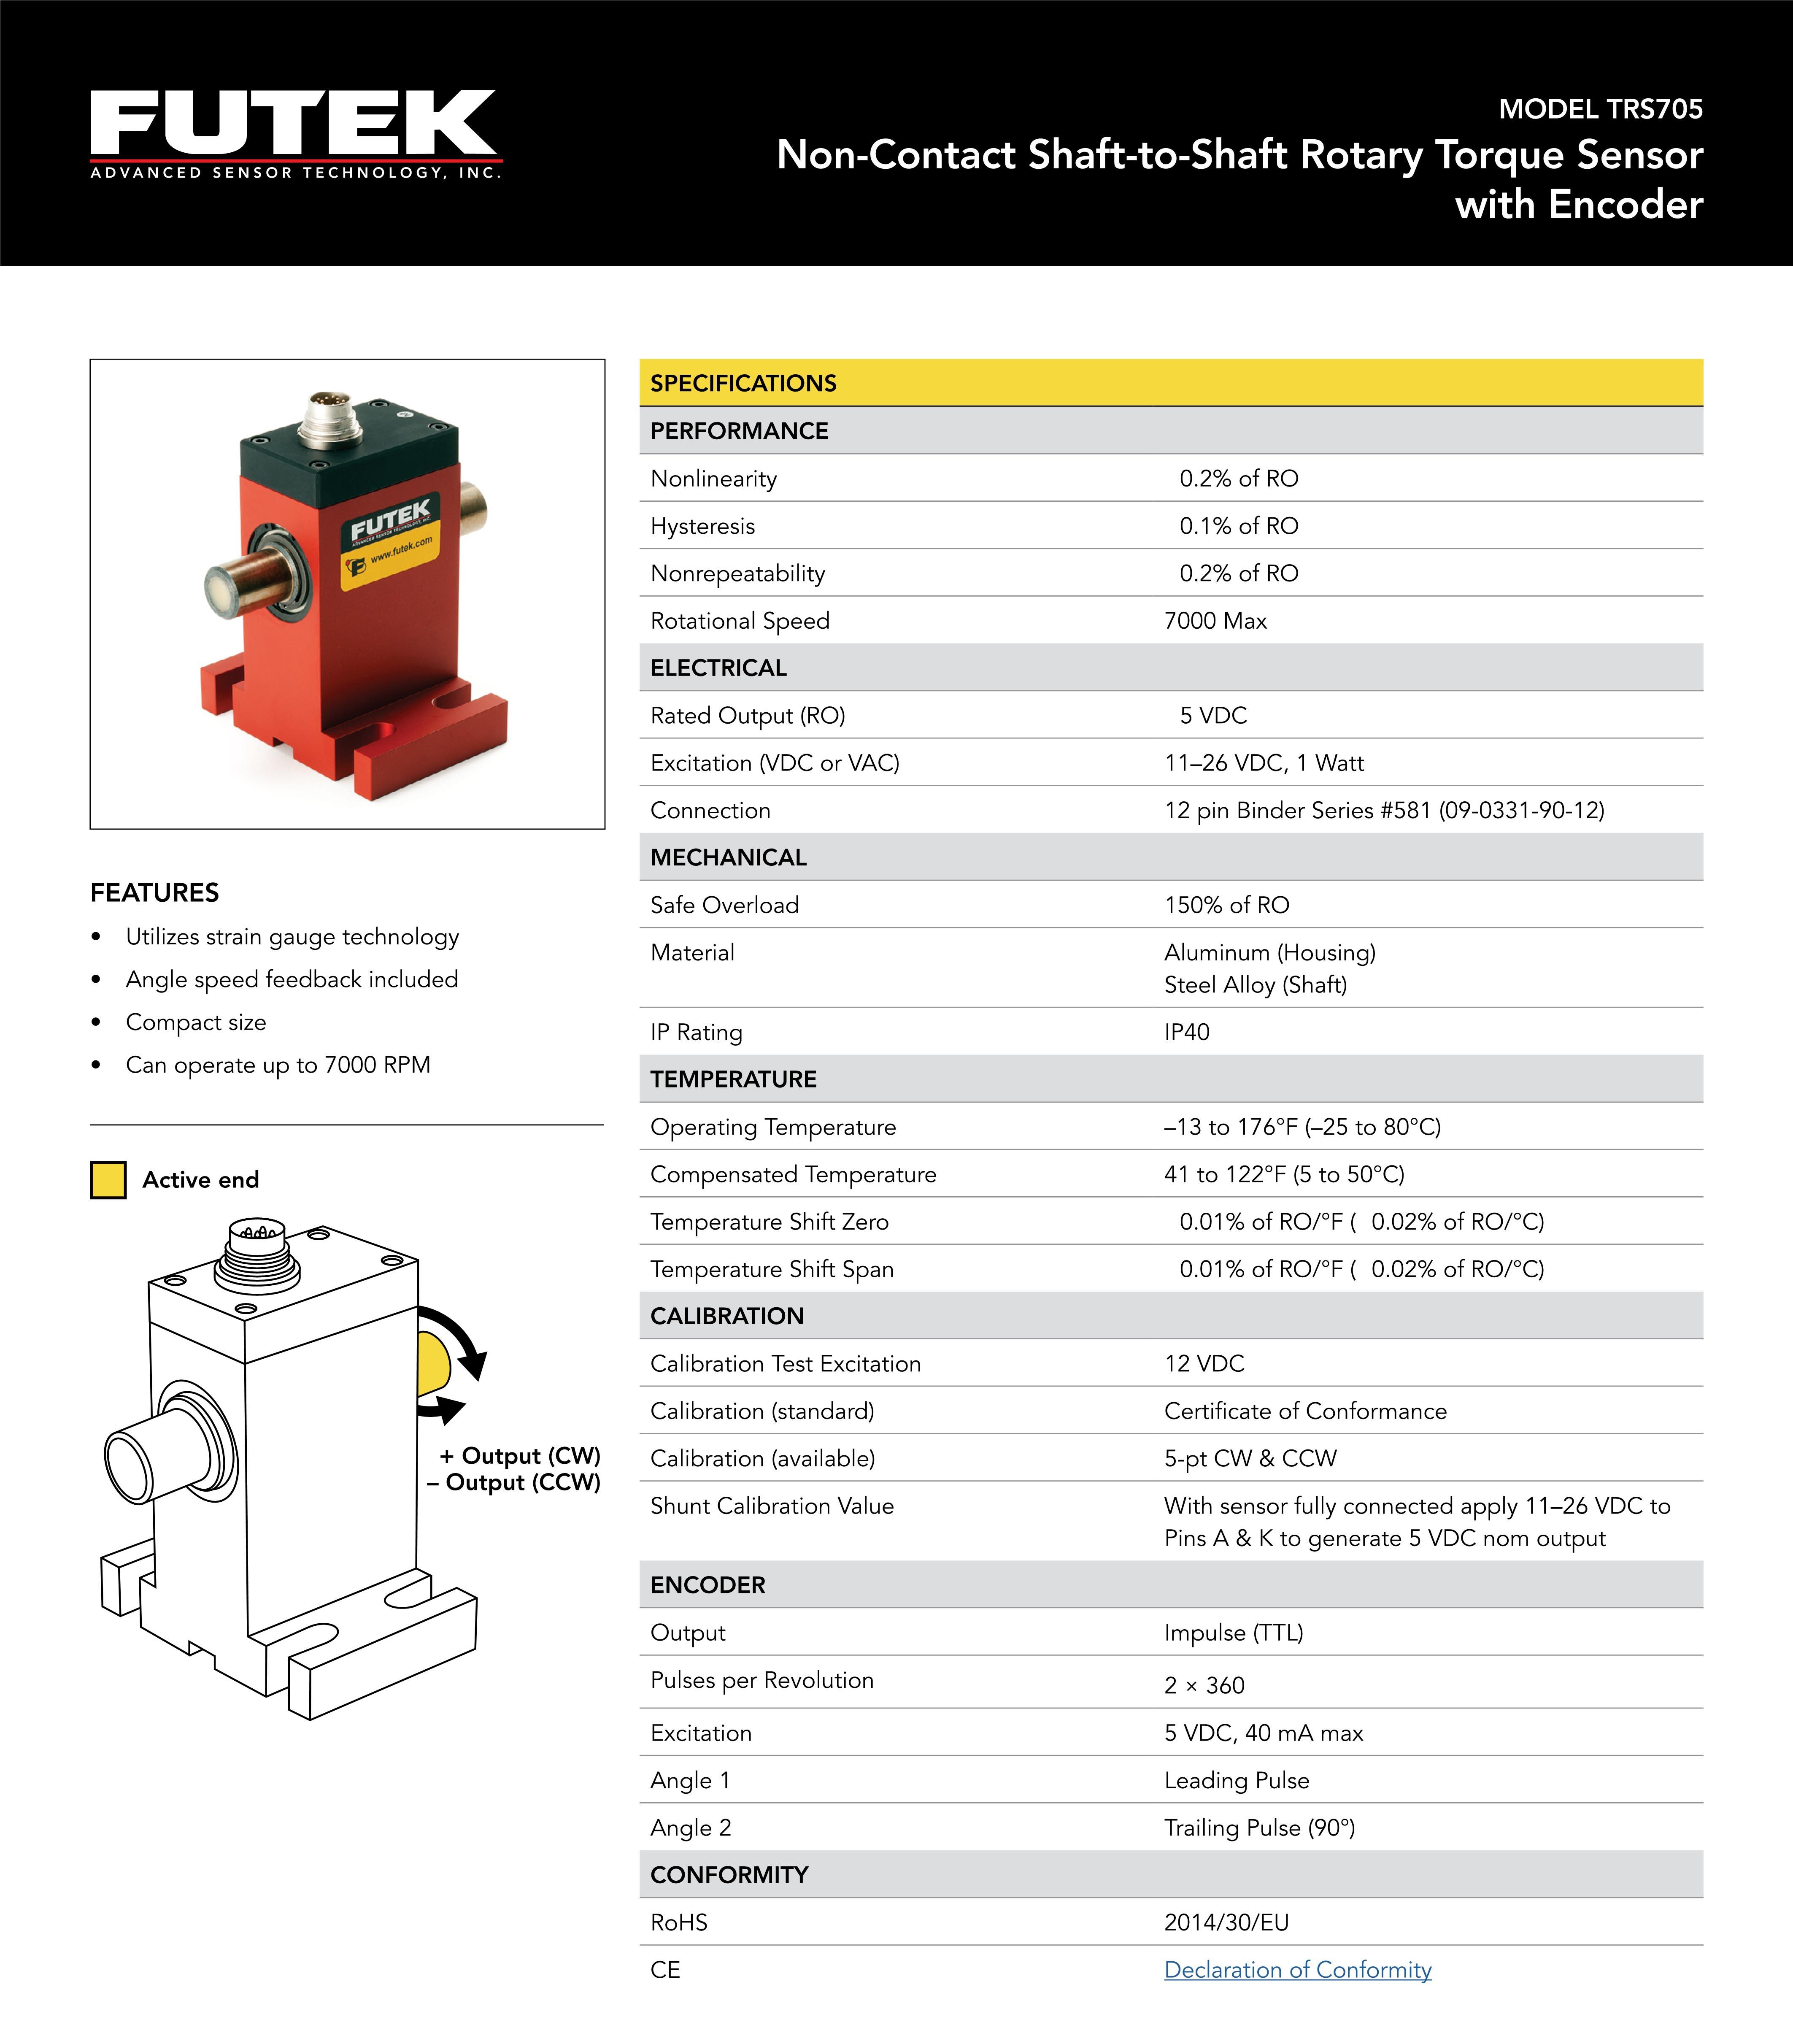 TRS705动态扭矩传感器旋转式非接触式美国FUTEK